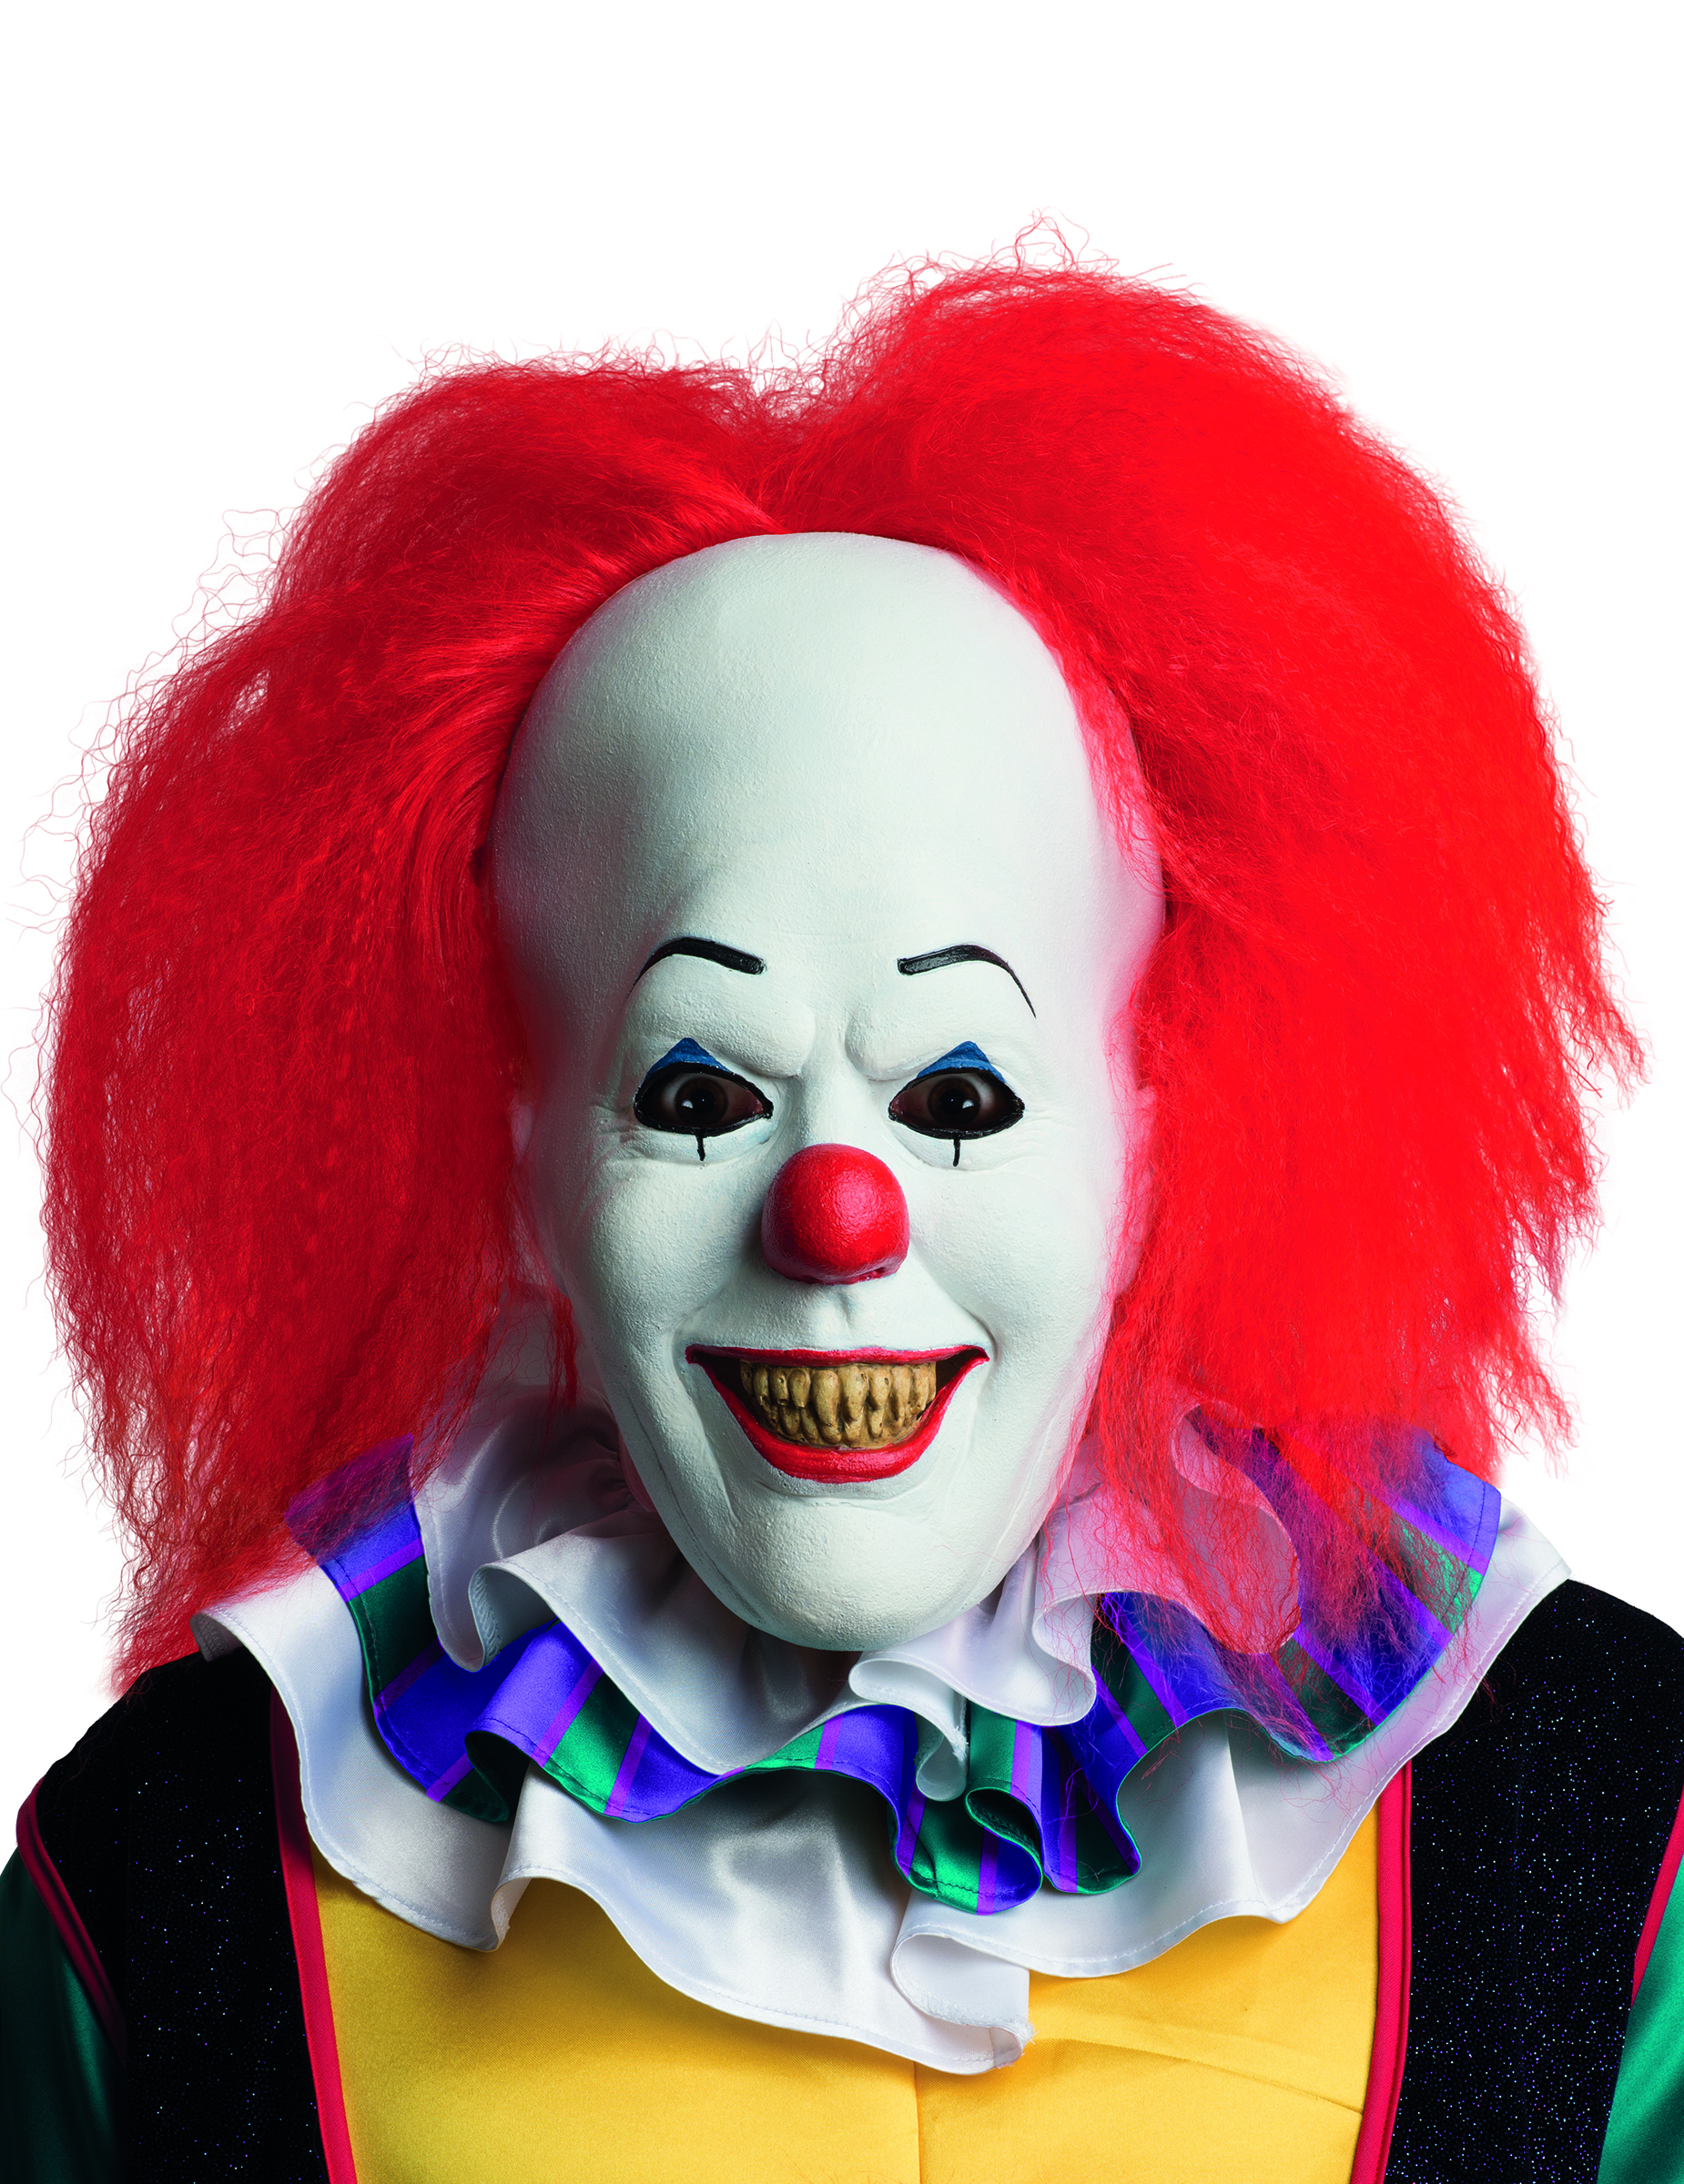 maschera in lattice clown di it adulto maschere e vestiti di carnevale online vegaoo. Black Bedroom Furniture Sets. Home Design Ideas